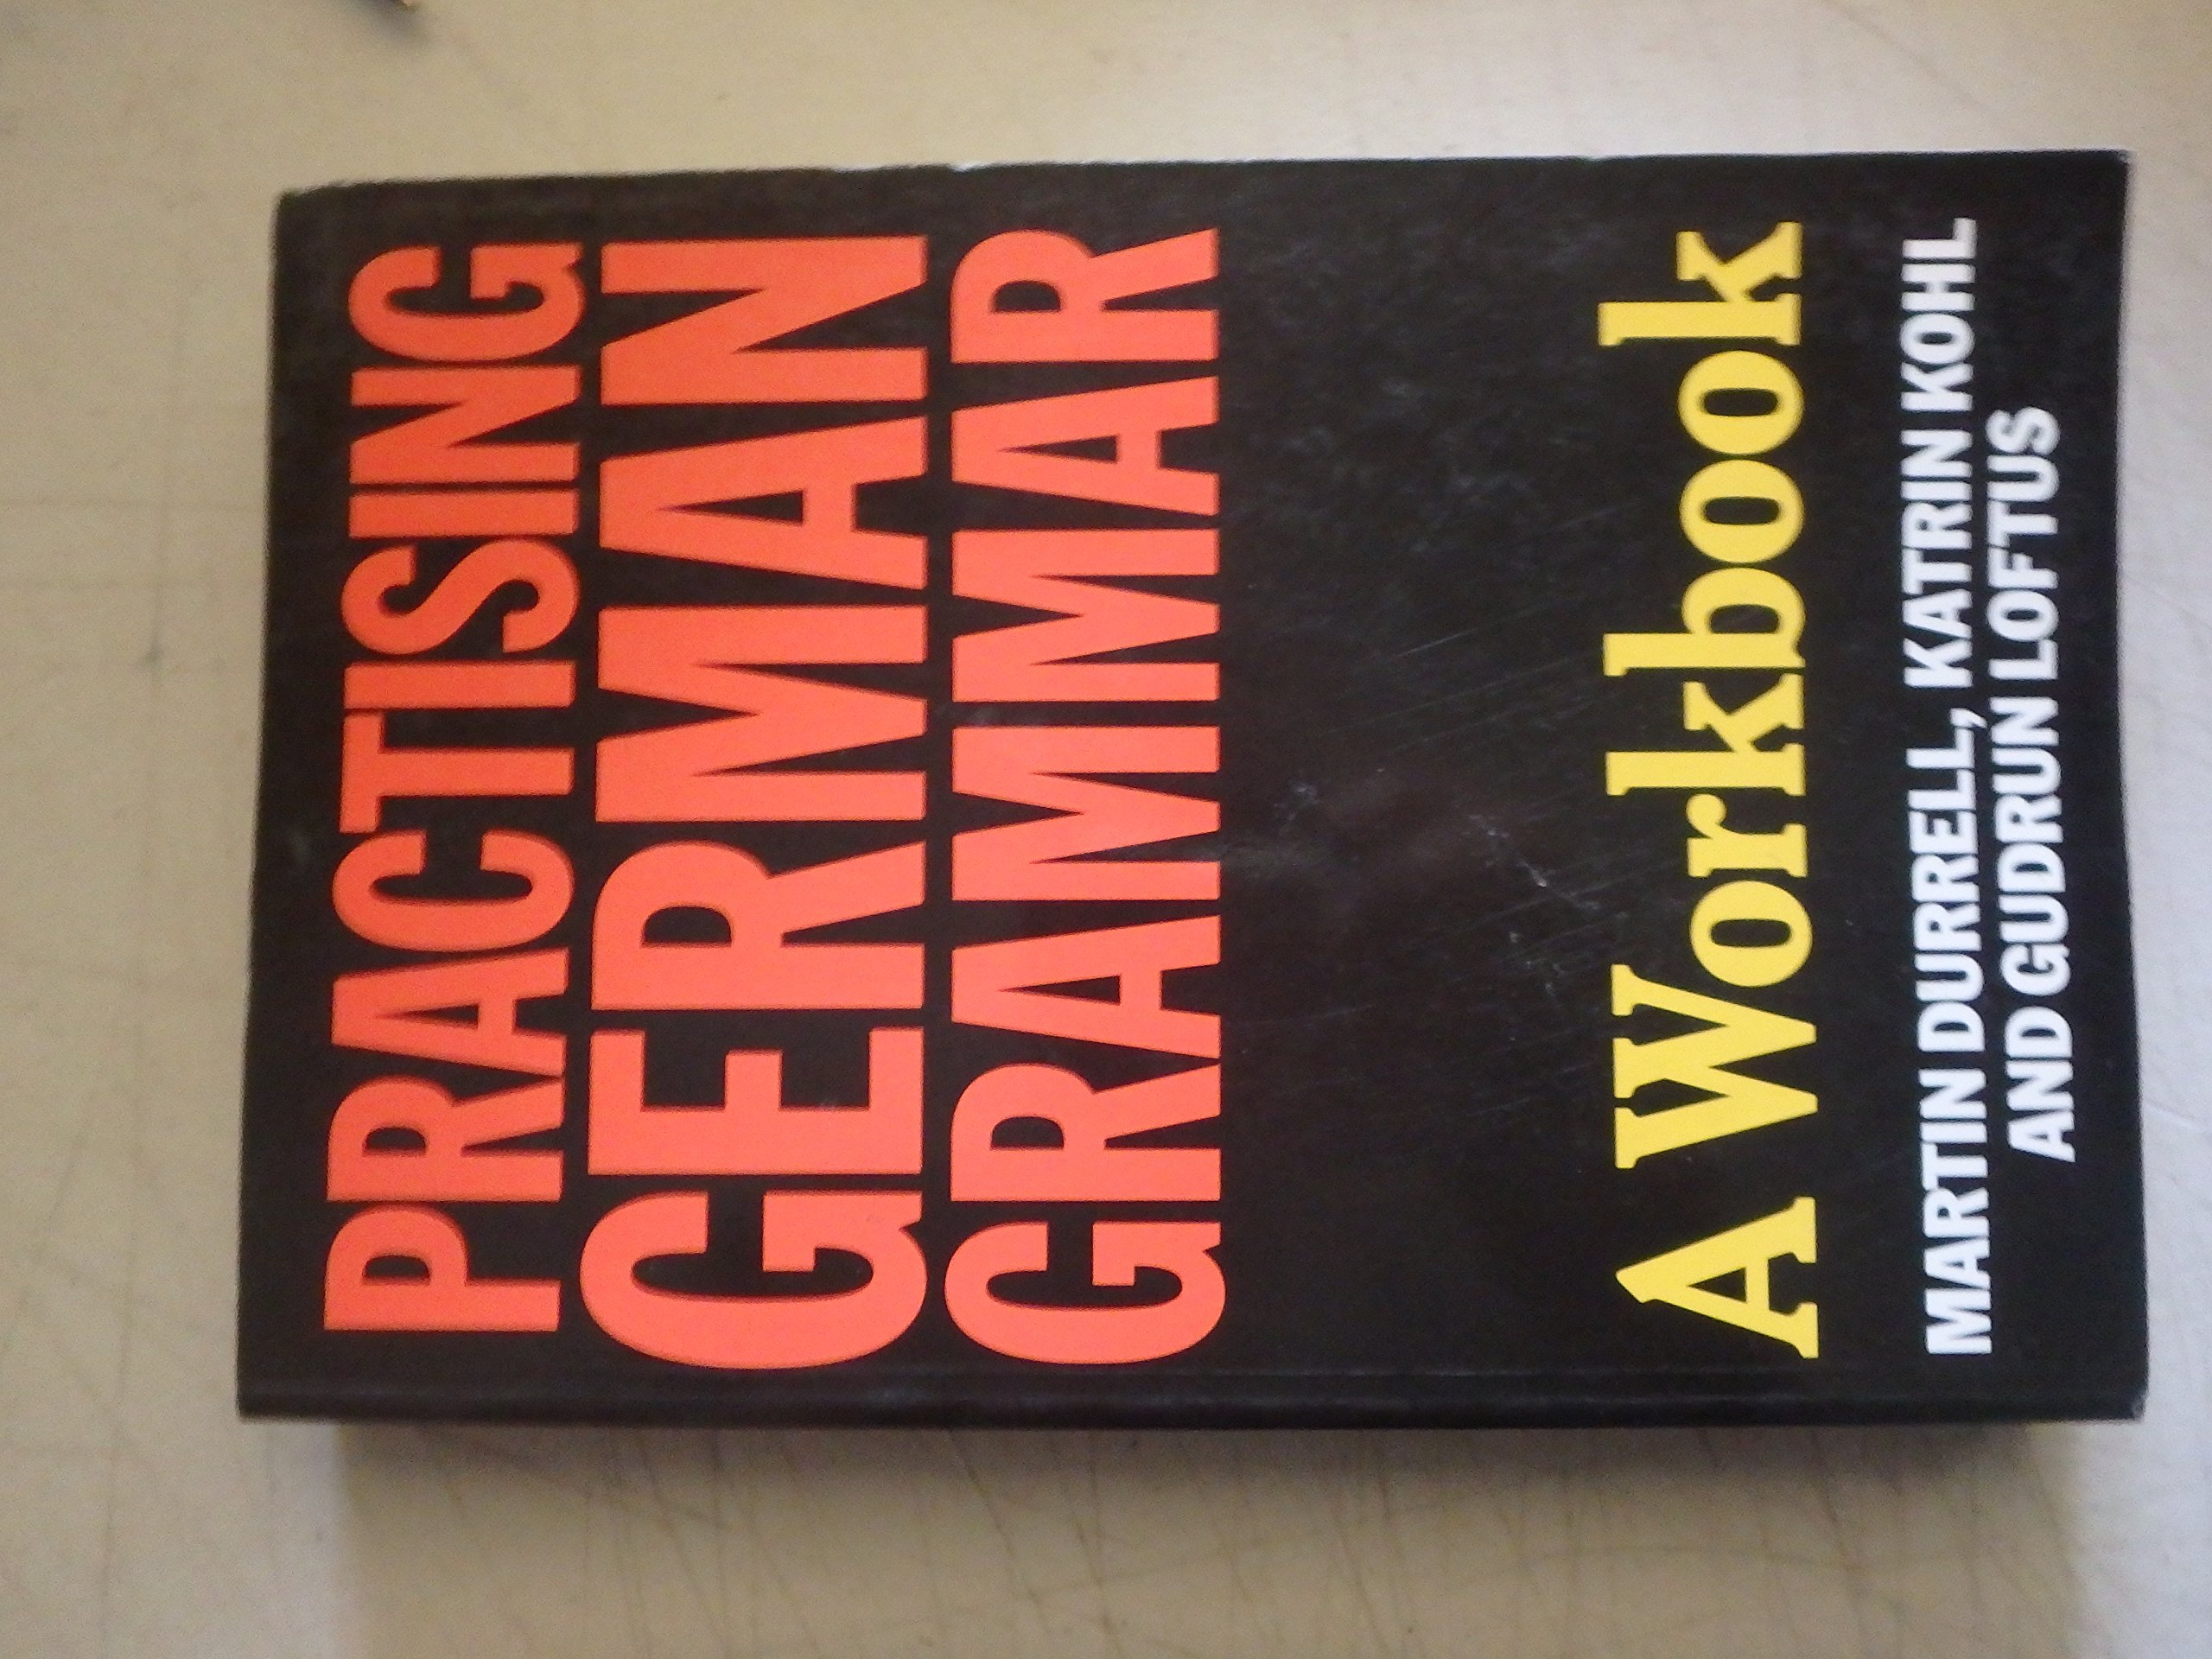 Practising german grammar a workbook amazon co uk martin durrell katrin kohl gudrun loftus 9780340583364 books